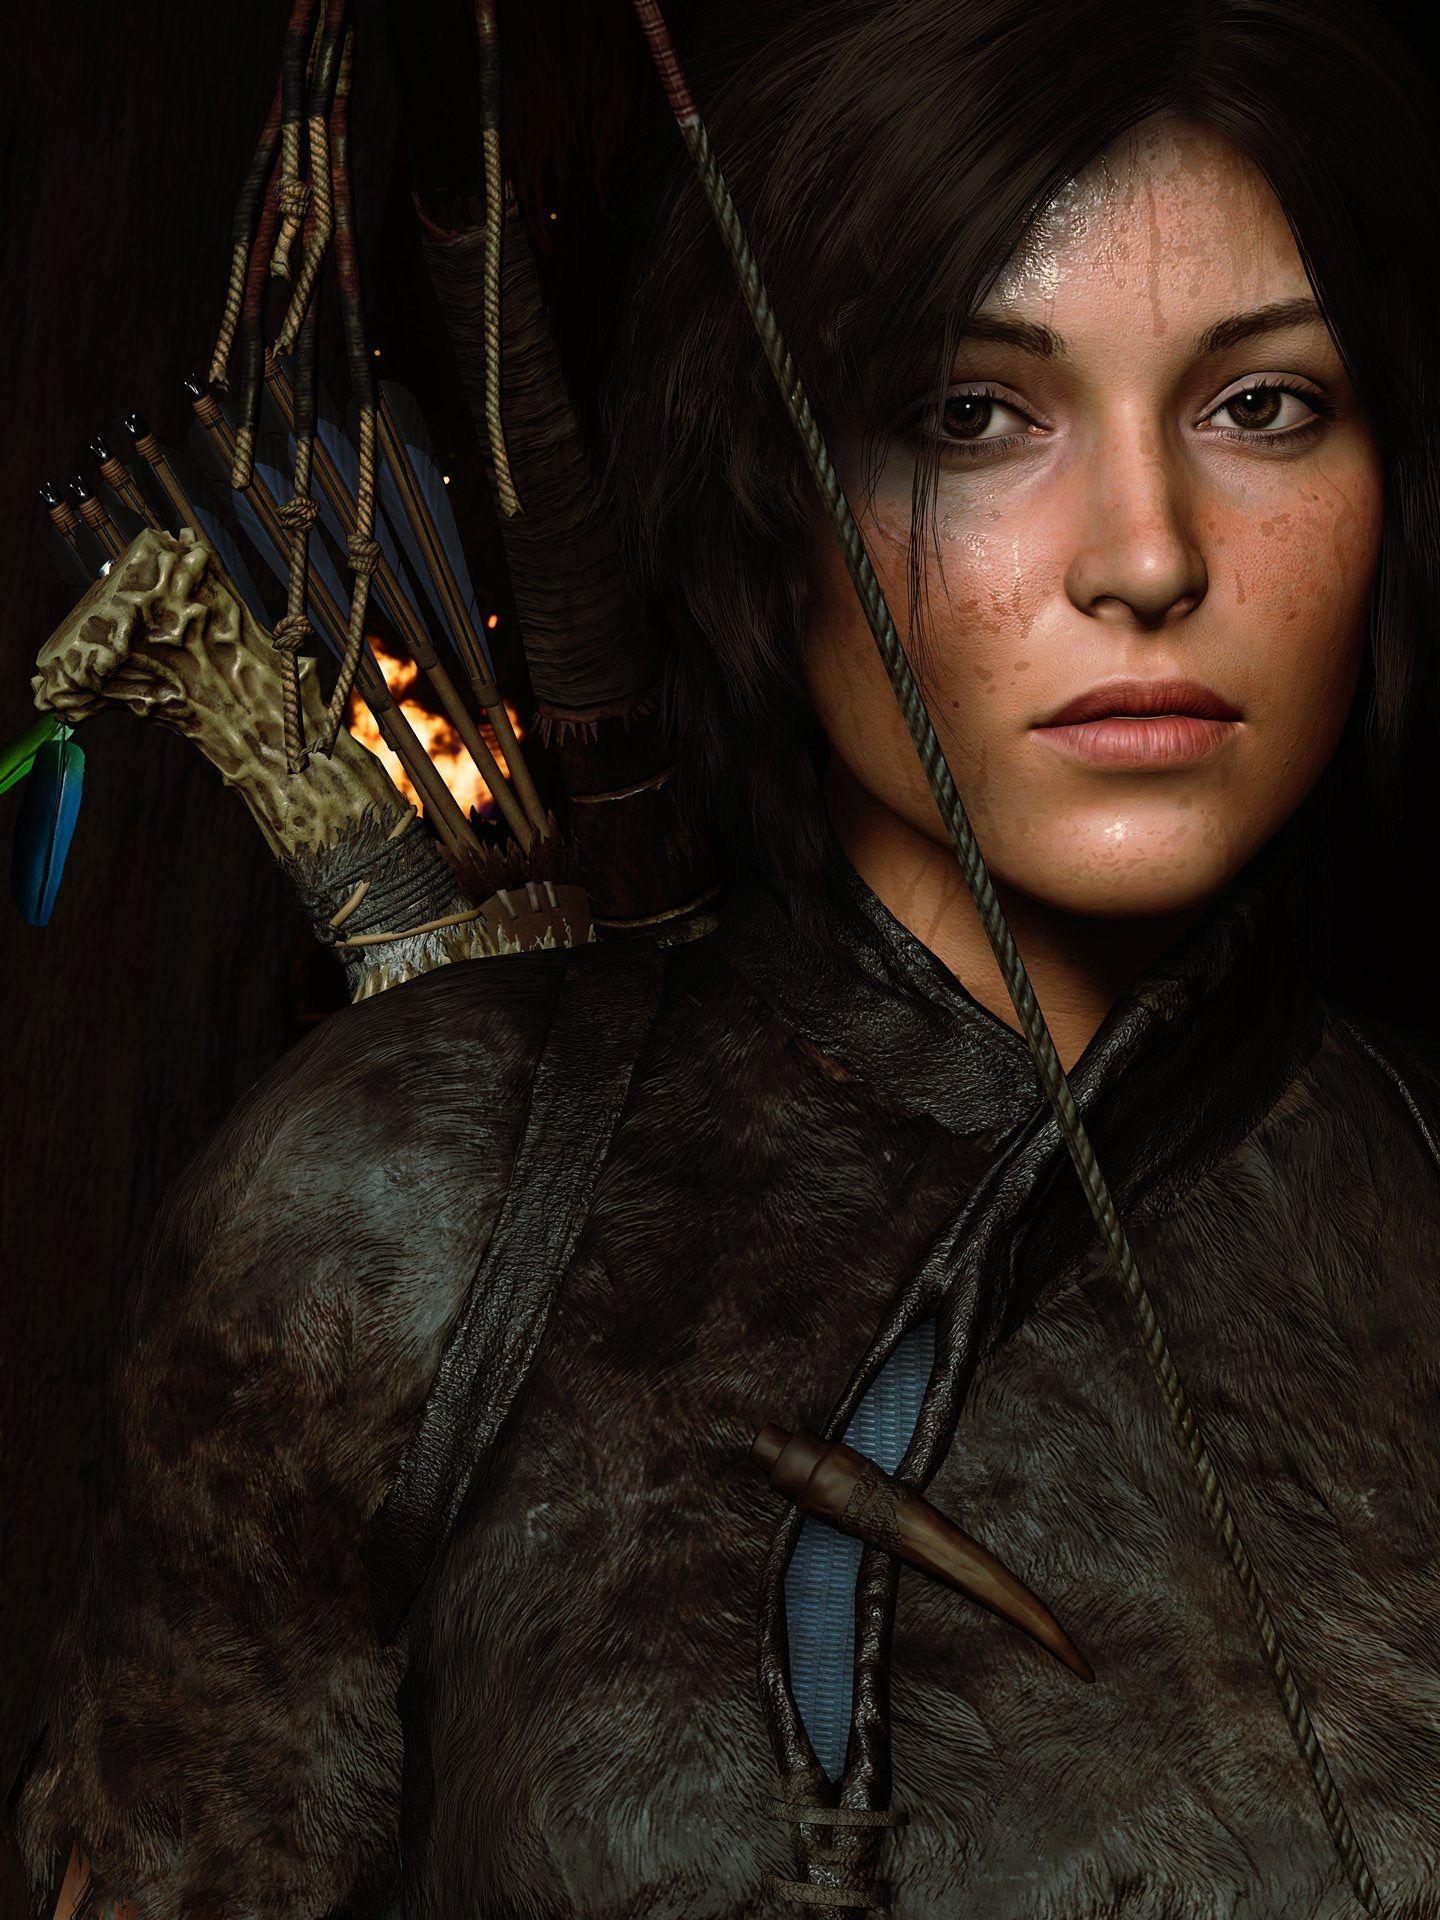 Shadow Of The Tomb Raider Tomb Raider Tomb Raider Game Tomb Raider 2013 Shadow of tomb raider video game